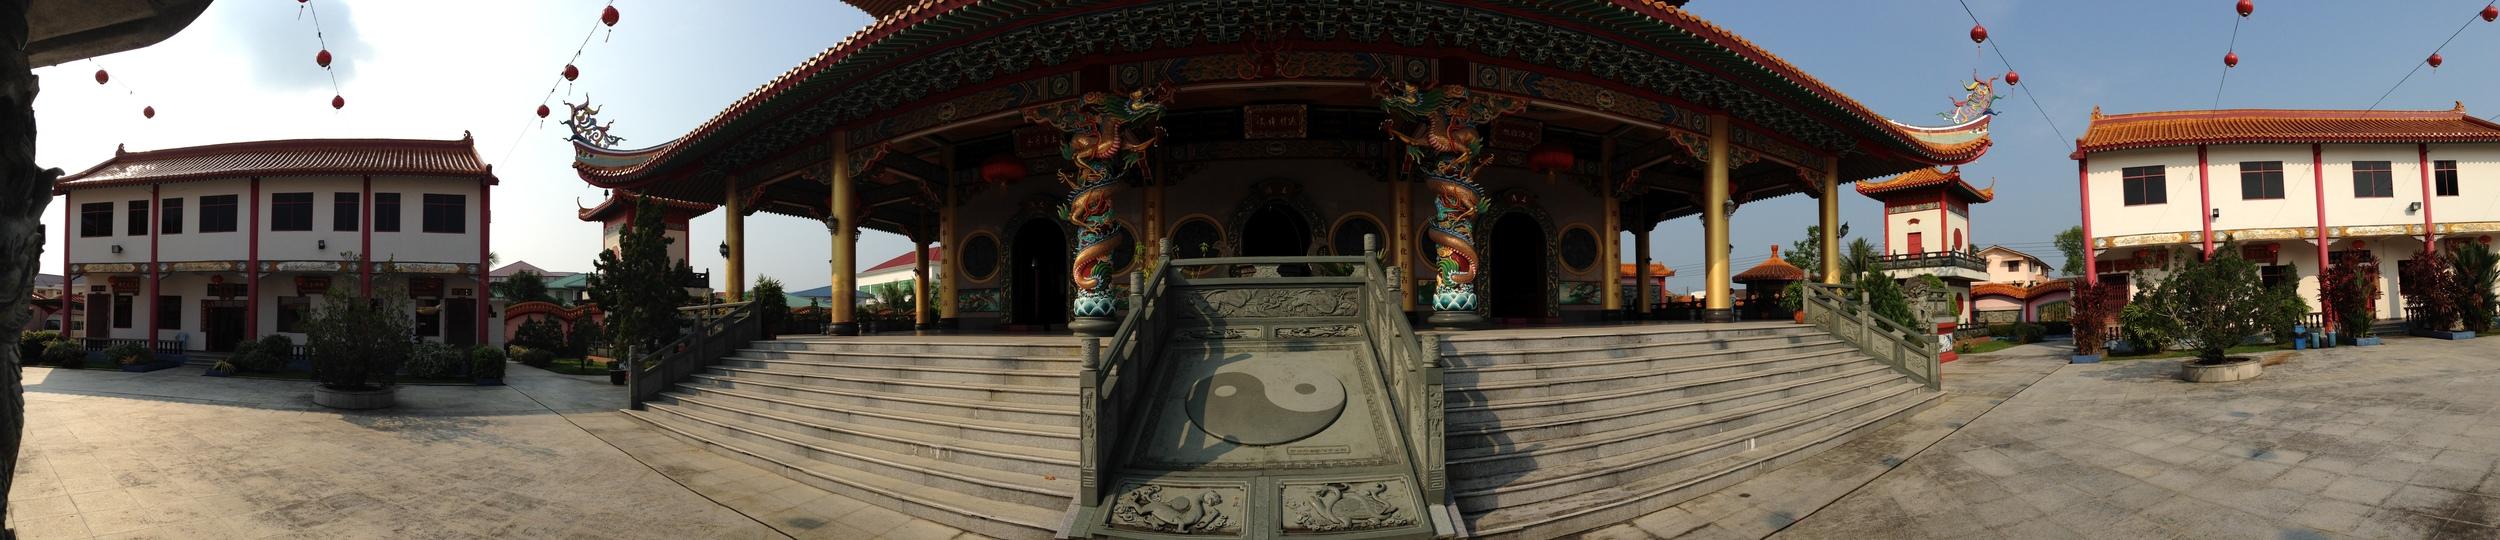 A Taoist temple in Malaysia